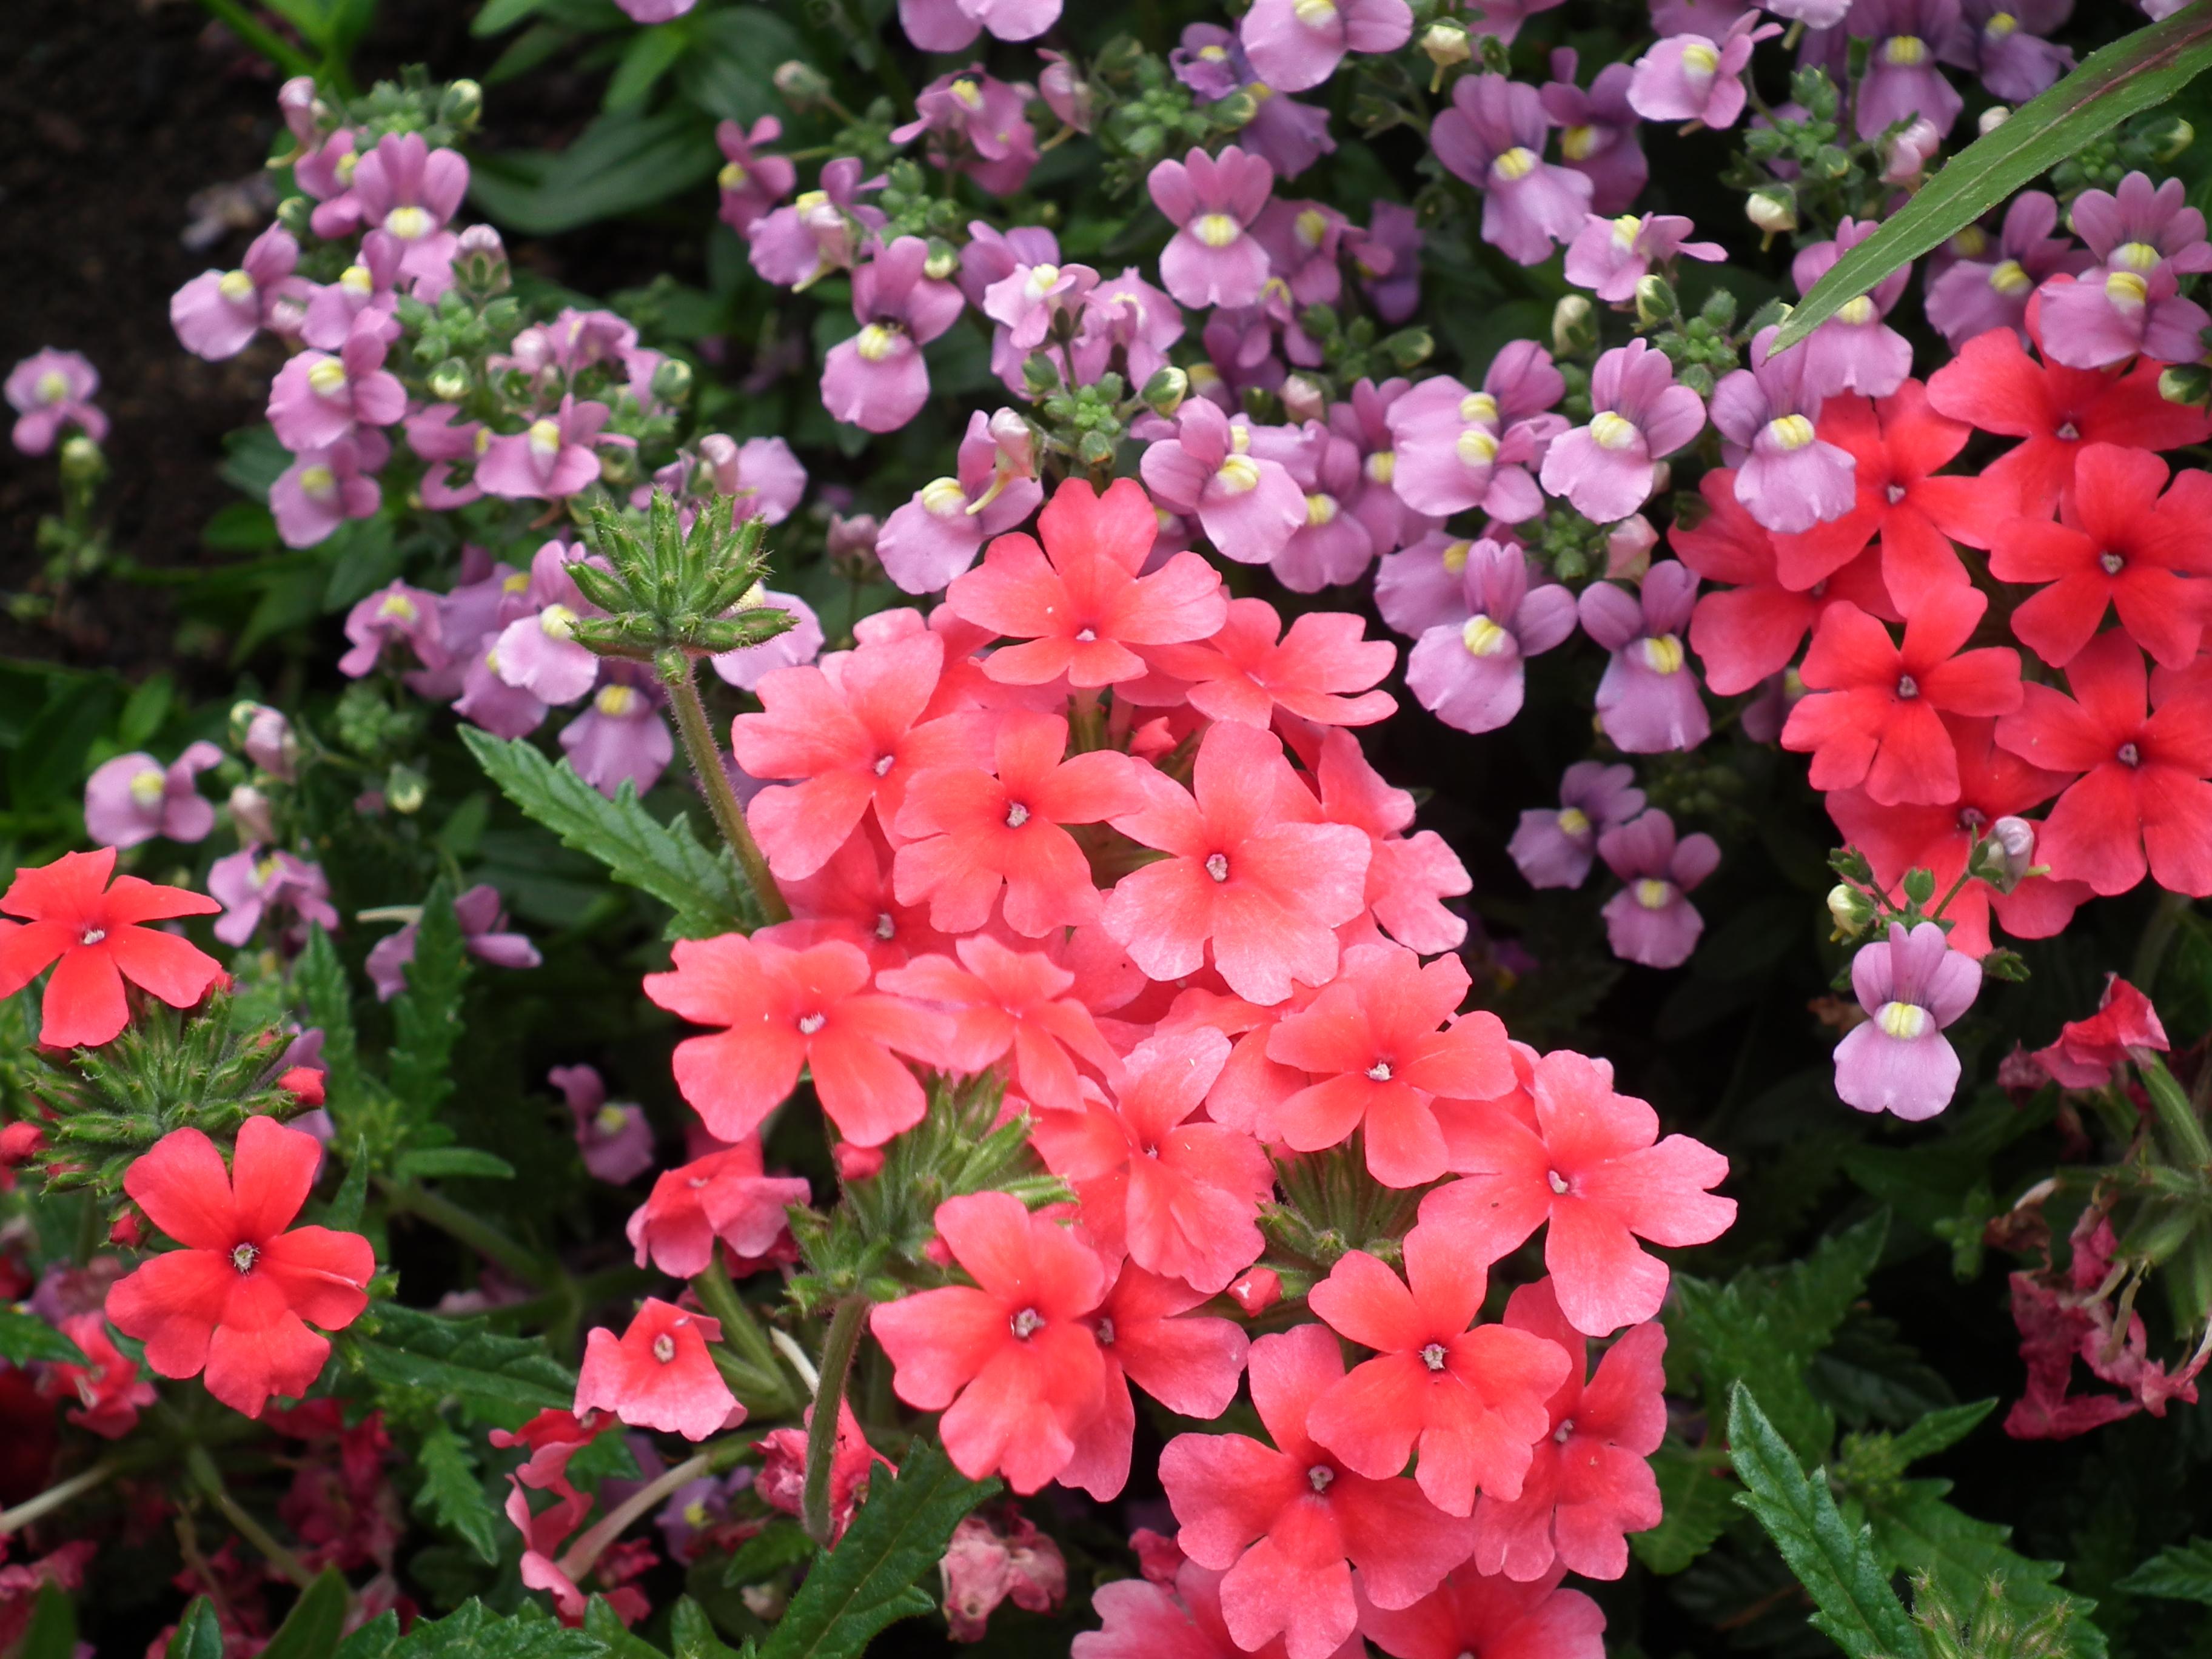 File:Fleurs, jardin public de Saintes.JPG - Wikimedia Commons